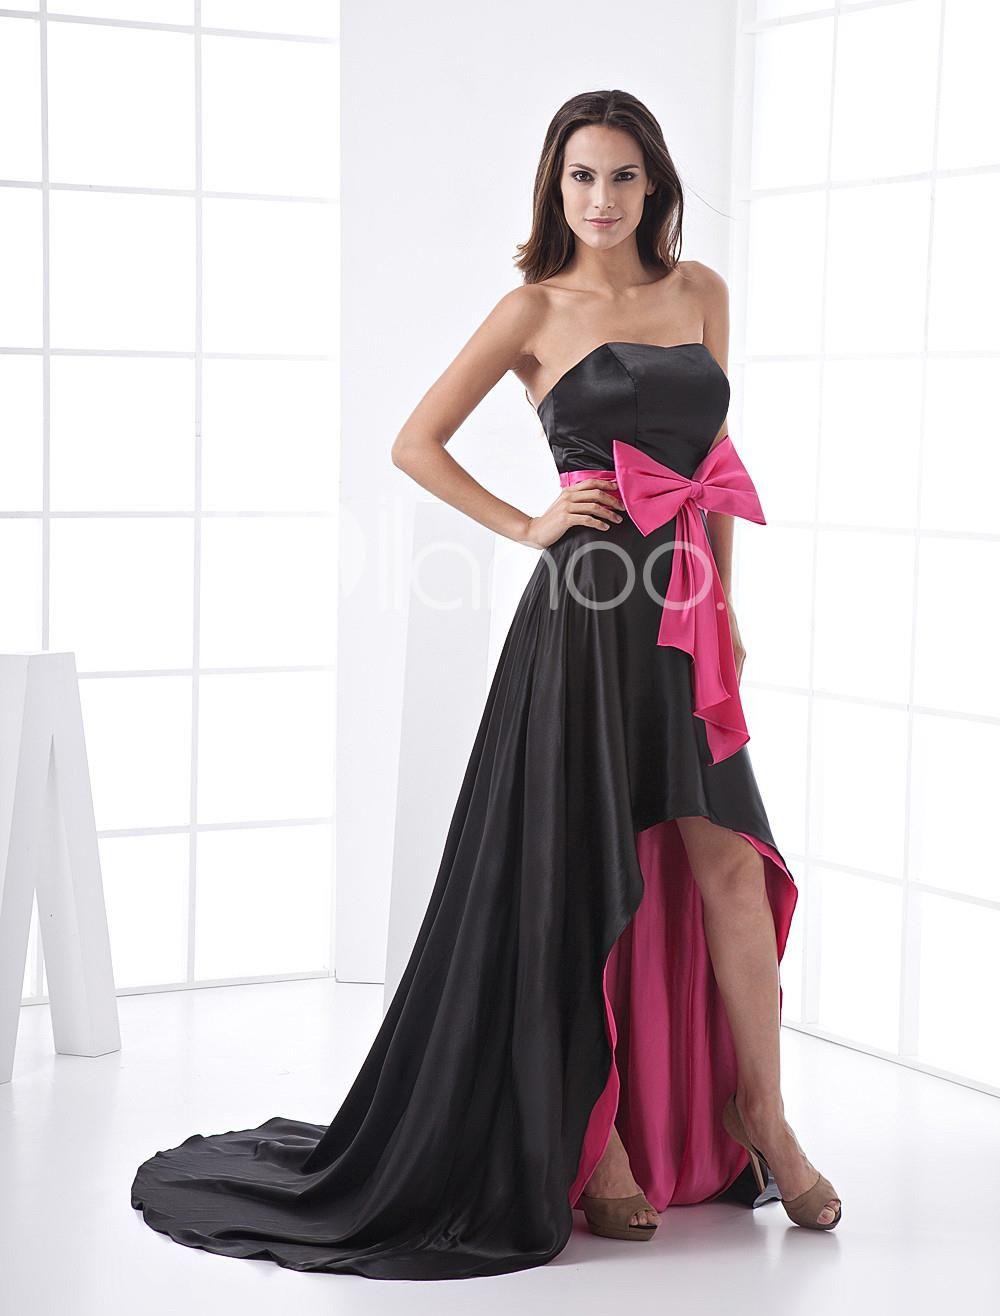 Aline strapless satin empire waist sash long in back short in front